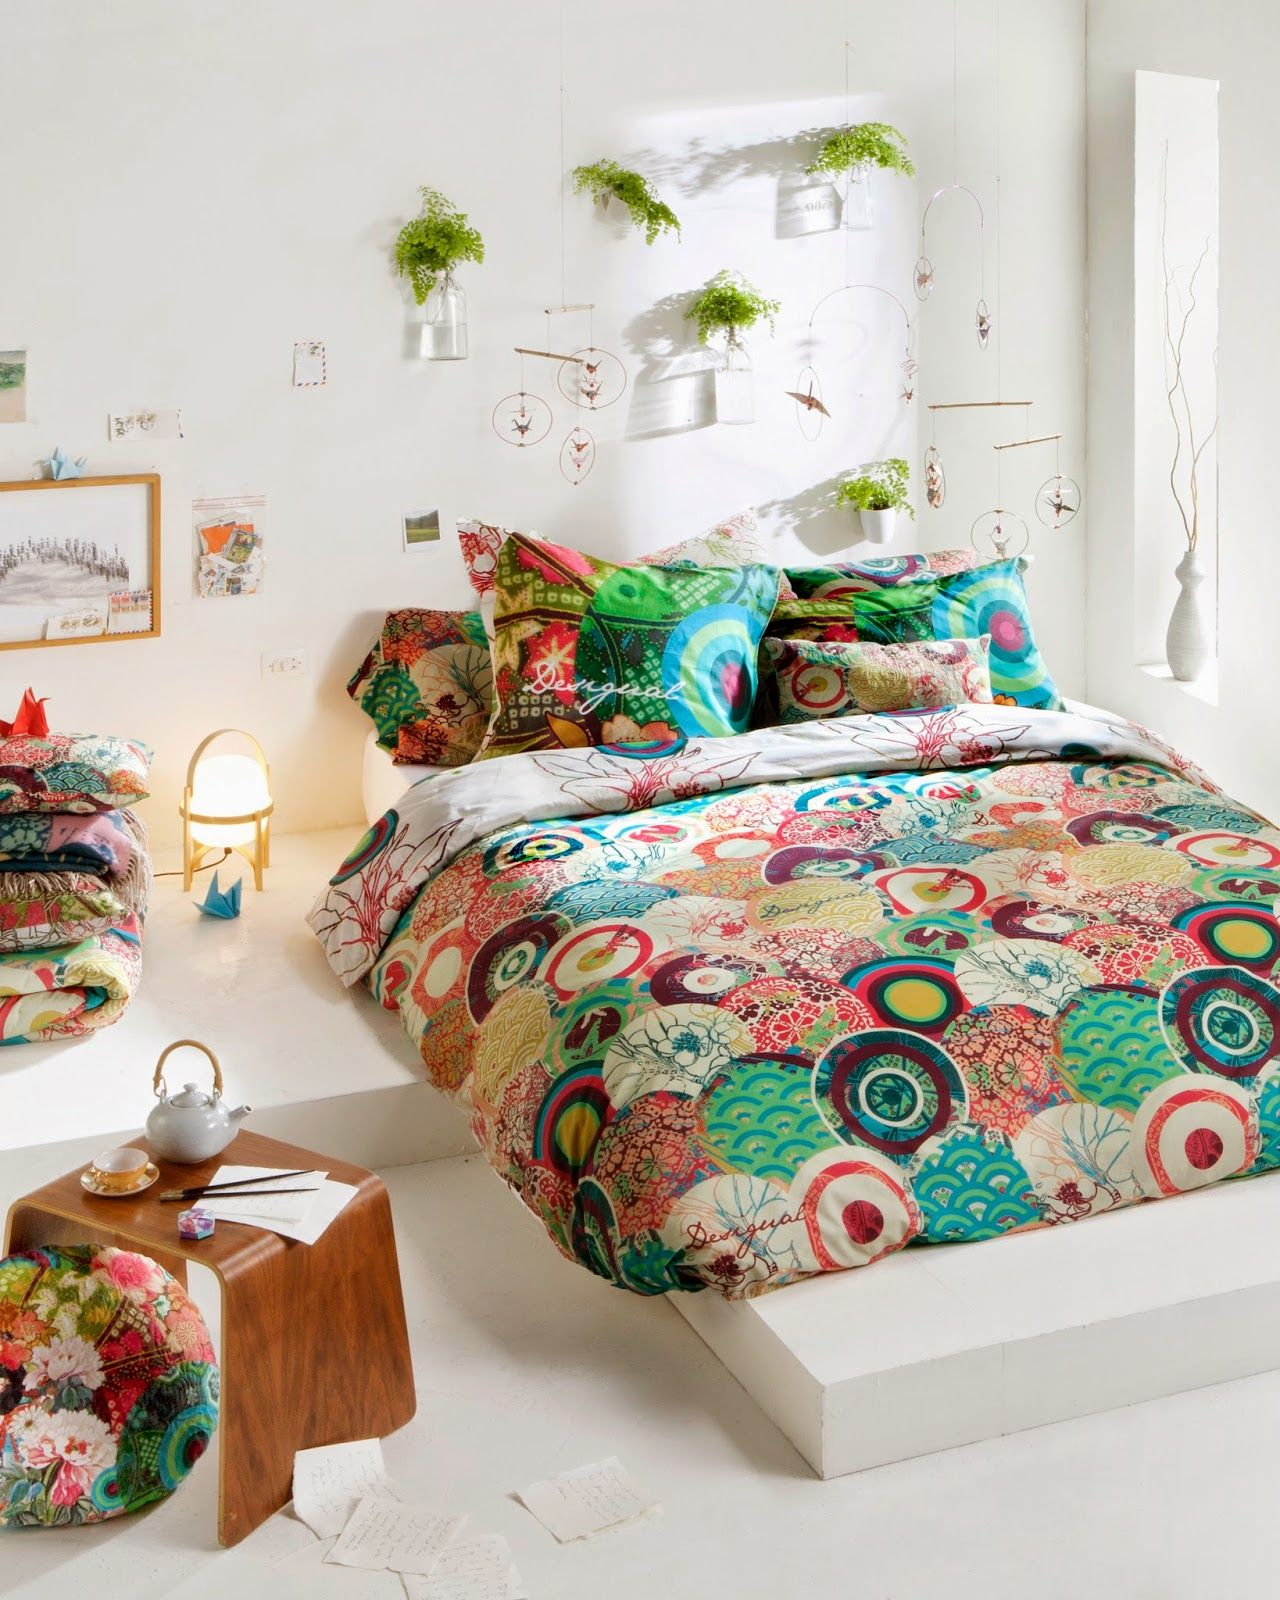 Rooms desigual living desigual pinterest room and - Desigual home decor ...